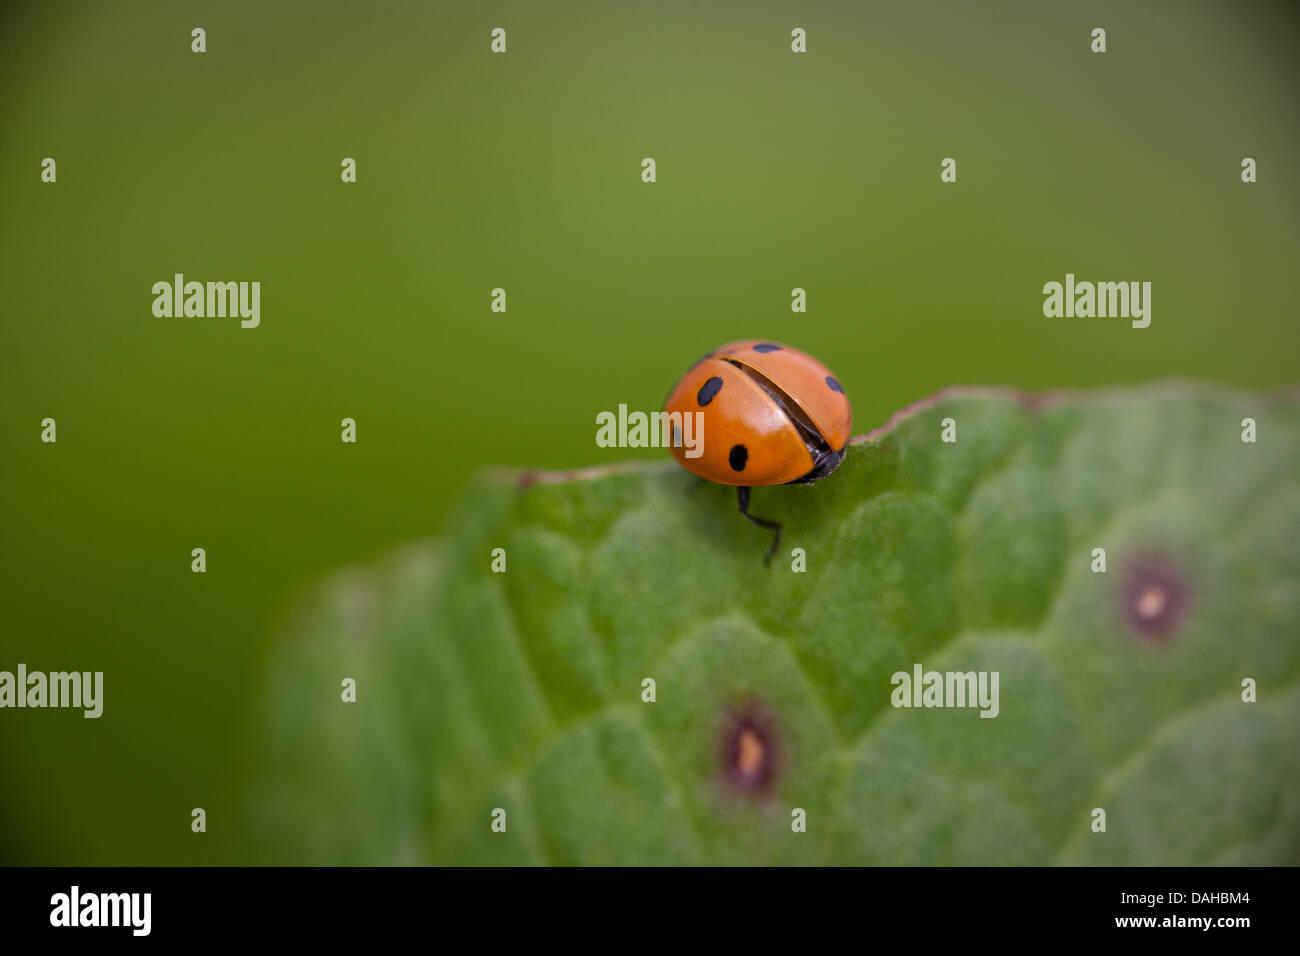 Spotted Ladybug, Coccinella septempunctata, at Evje in Rygge kommune, Østfold fylke, Norway. - Stock Image